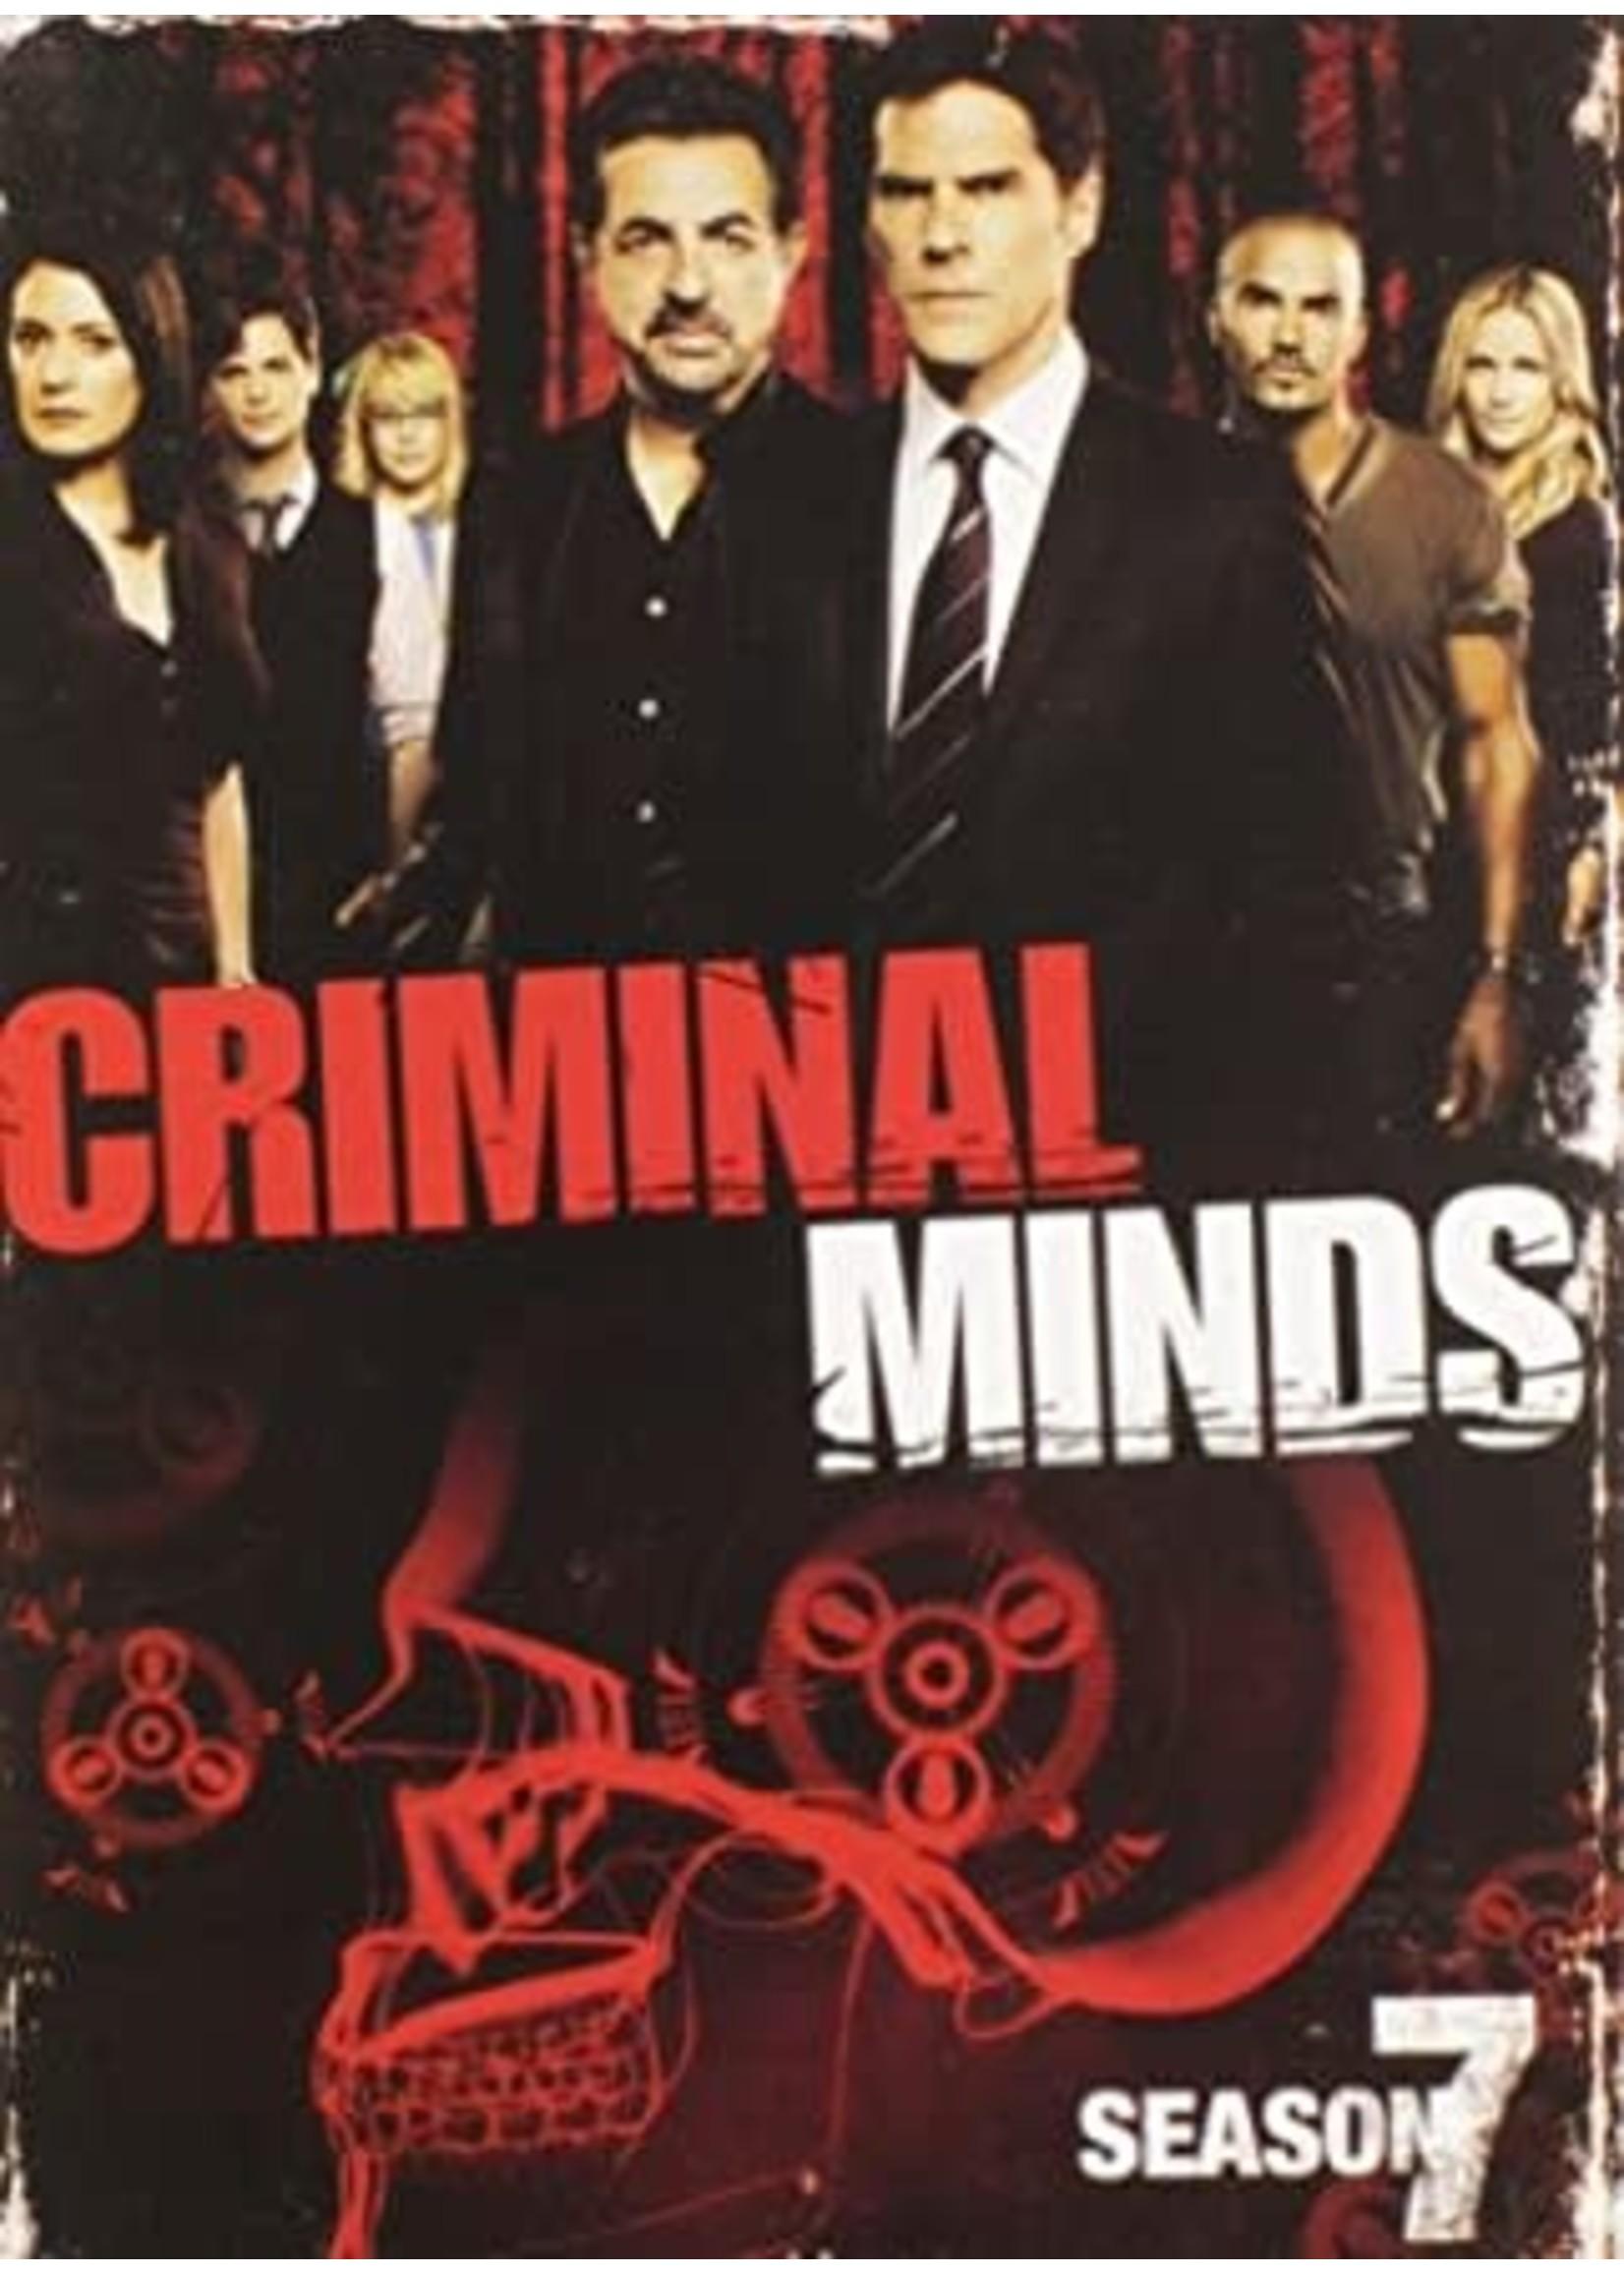 Criminal Minds Season 7 DVD